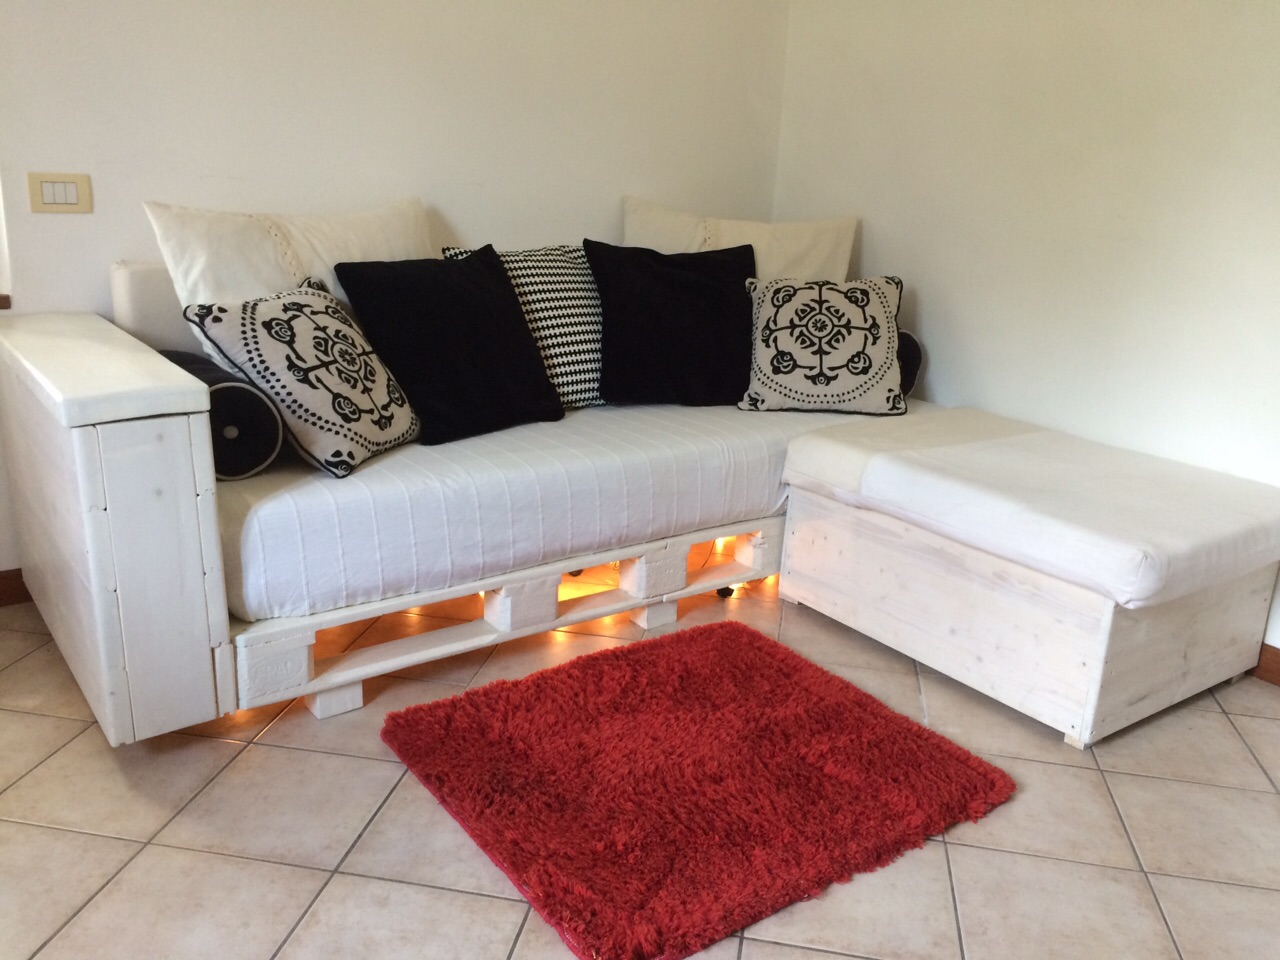 Come arredare casa con poco reoose nulla inutile blog - Un divano per dodici ...